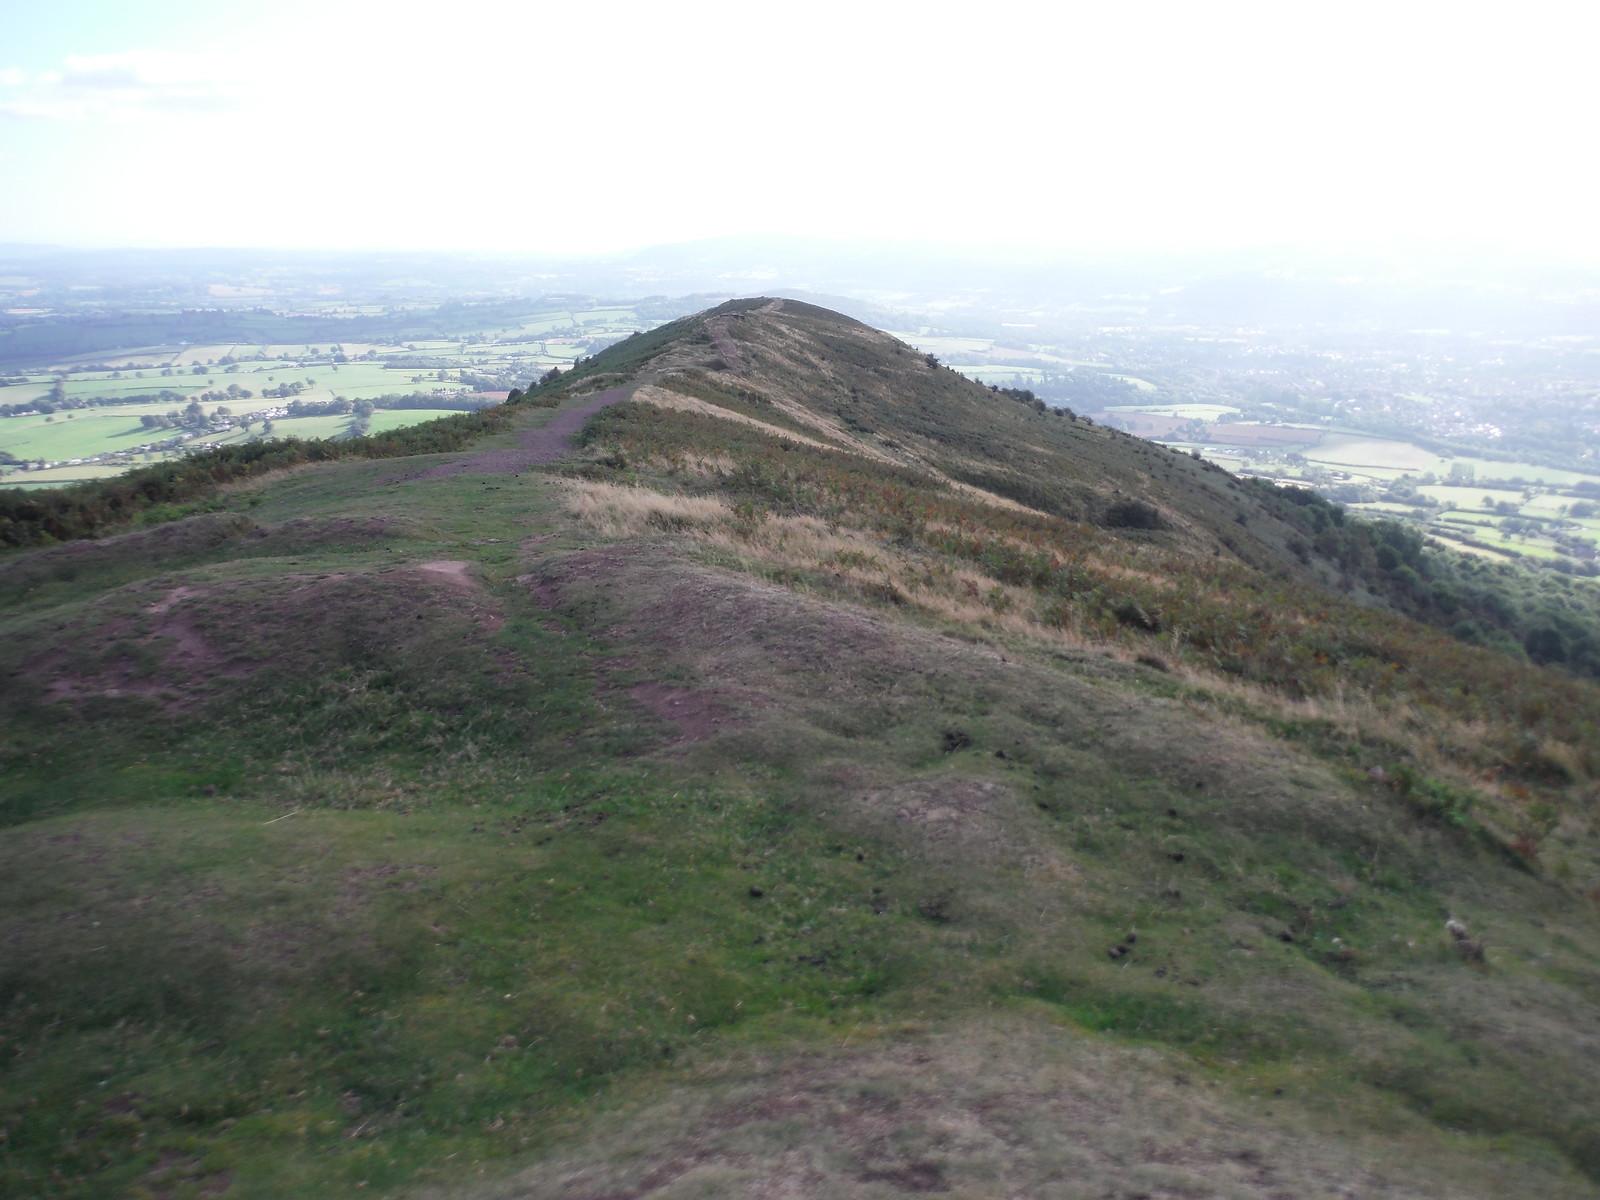 Signs of Iron Age Hillfort site, top of The Skirrid SWC Walk 347 - Llanvihangel Crucorney Circular (via Bryn Arw and The Skirrid)